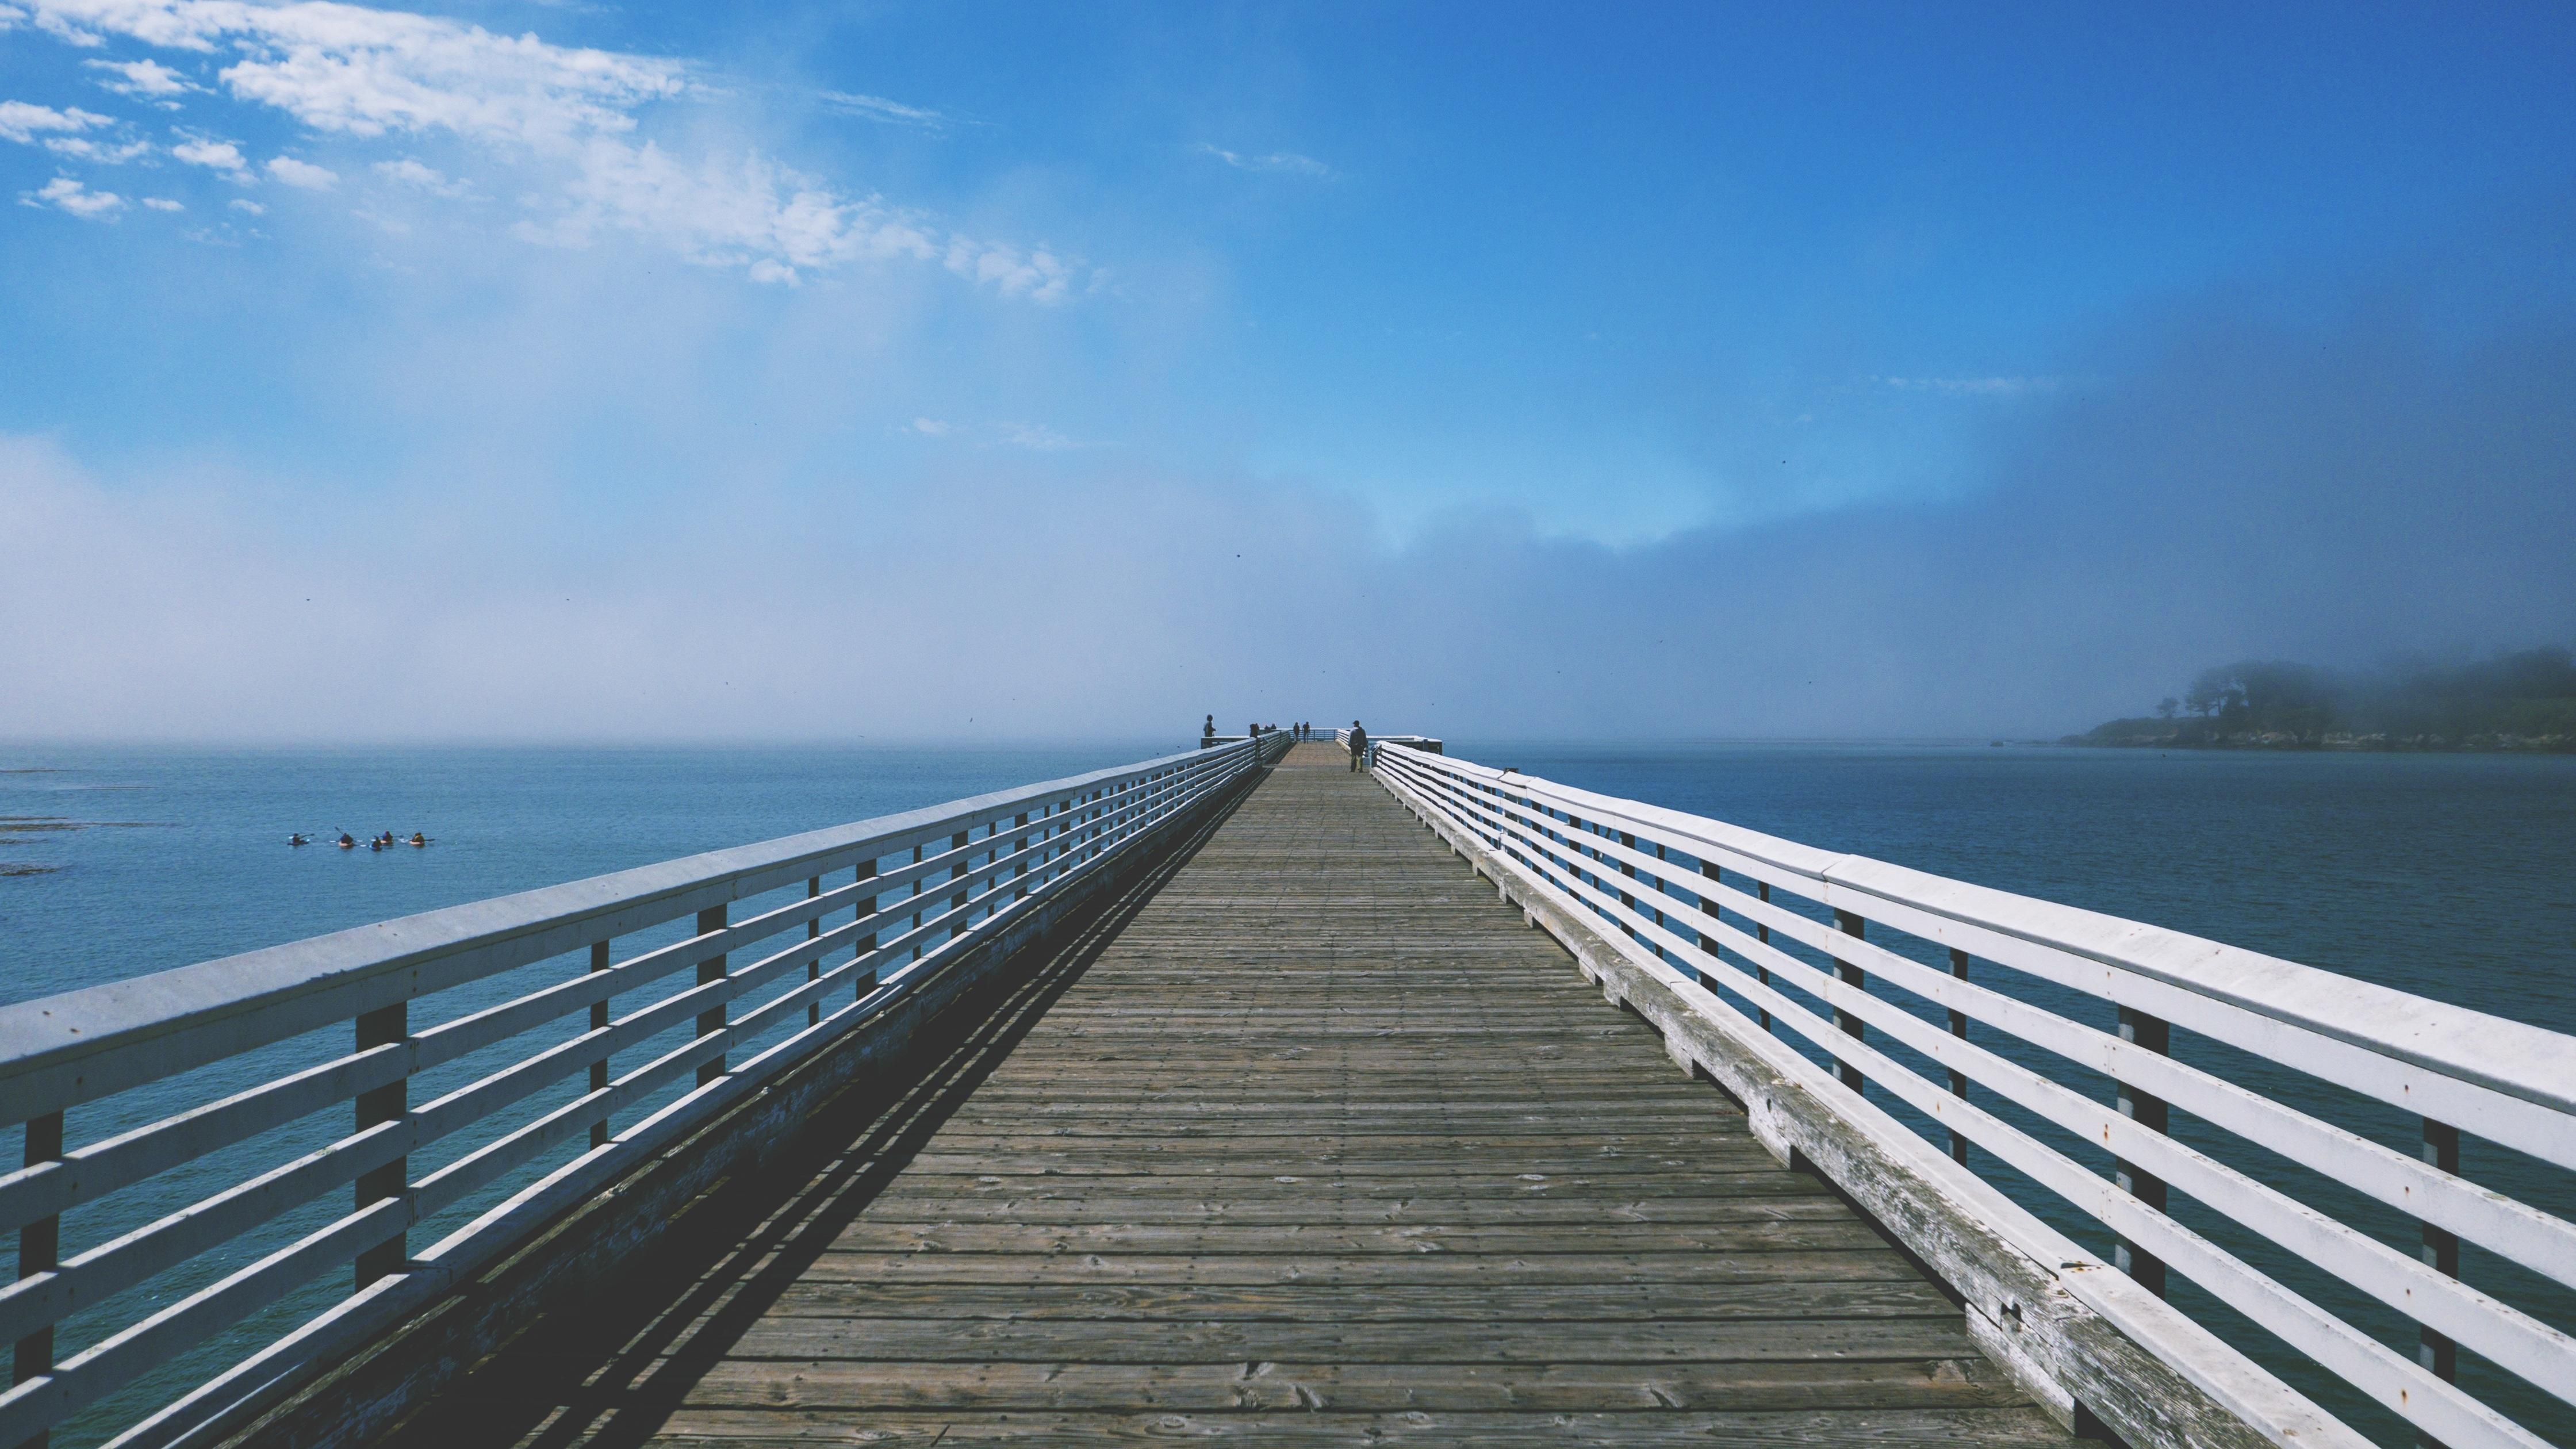 Sky Walk Boards : Free images sea coast water ocean horizon dock sky